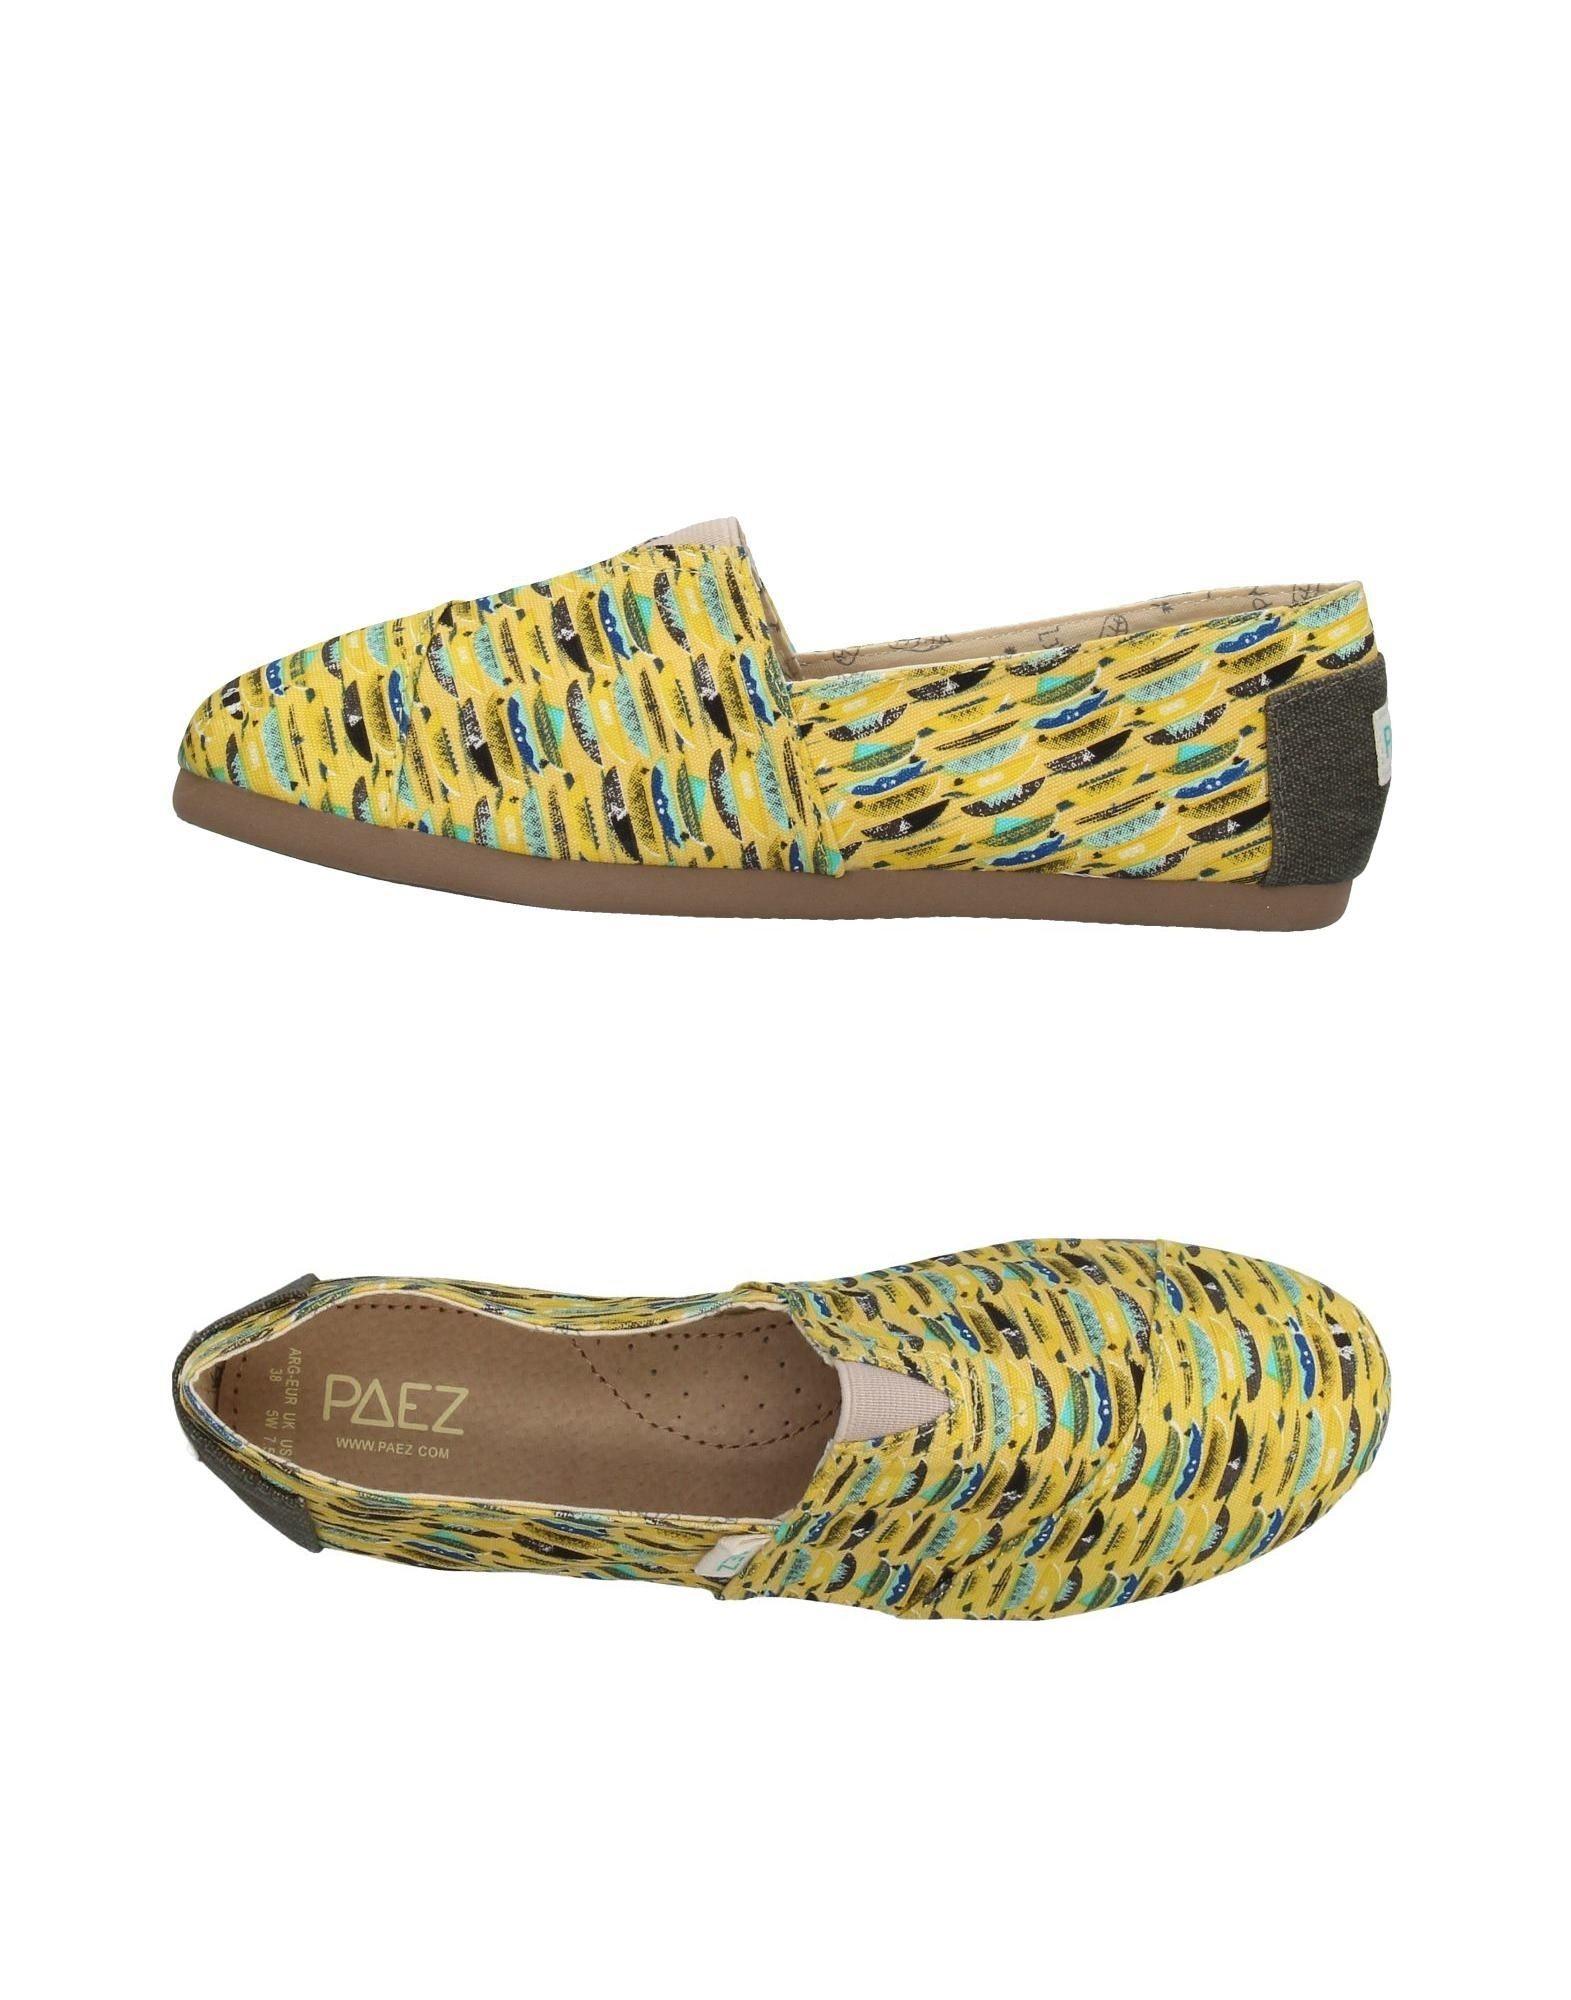 Sandali gialli per donna Paez  En Venta Baúl Manchester Aclaramiento Precio Bajo Para La Venta Footlocker Precio Barato Finishline o1QU6n7Hc